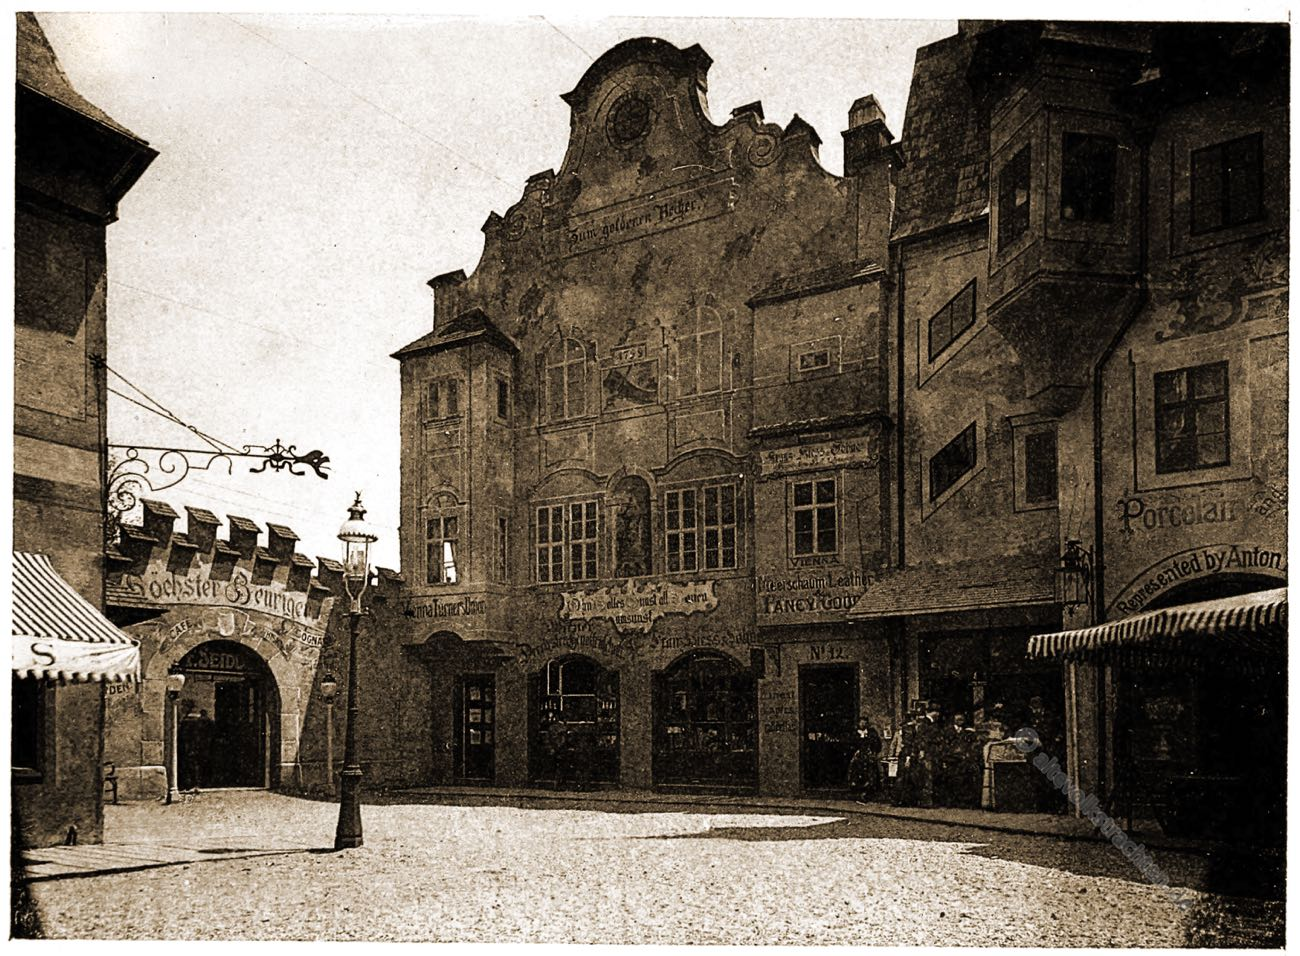 Alt-Wien, Columbian Exposition, Chicago, Adolph Wittemann, Stadtansicht